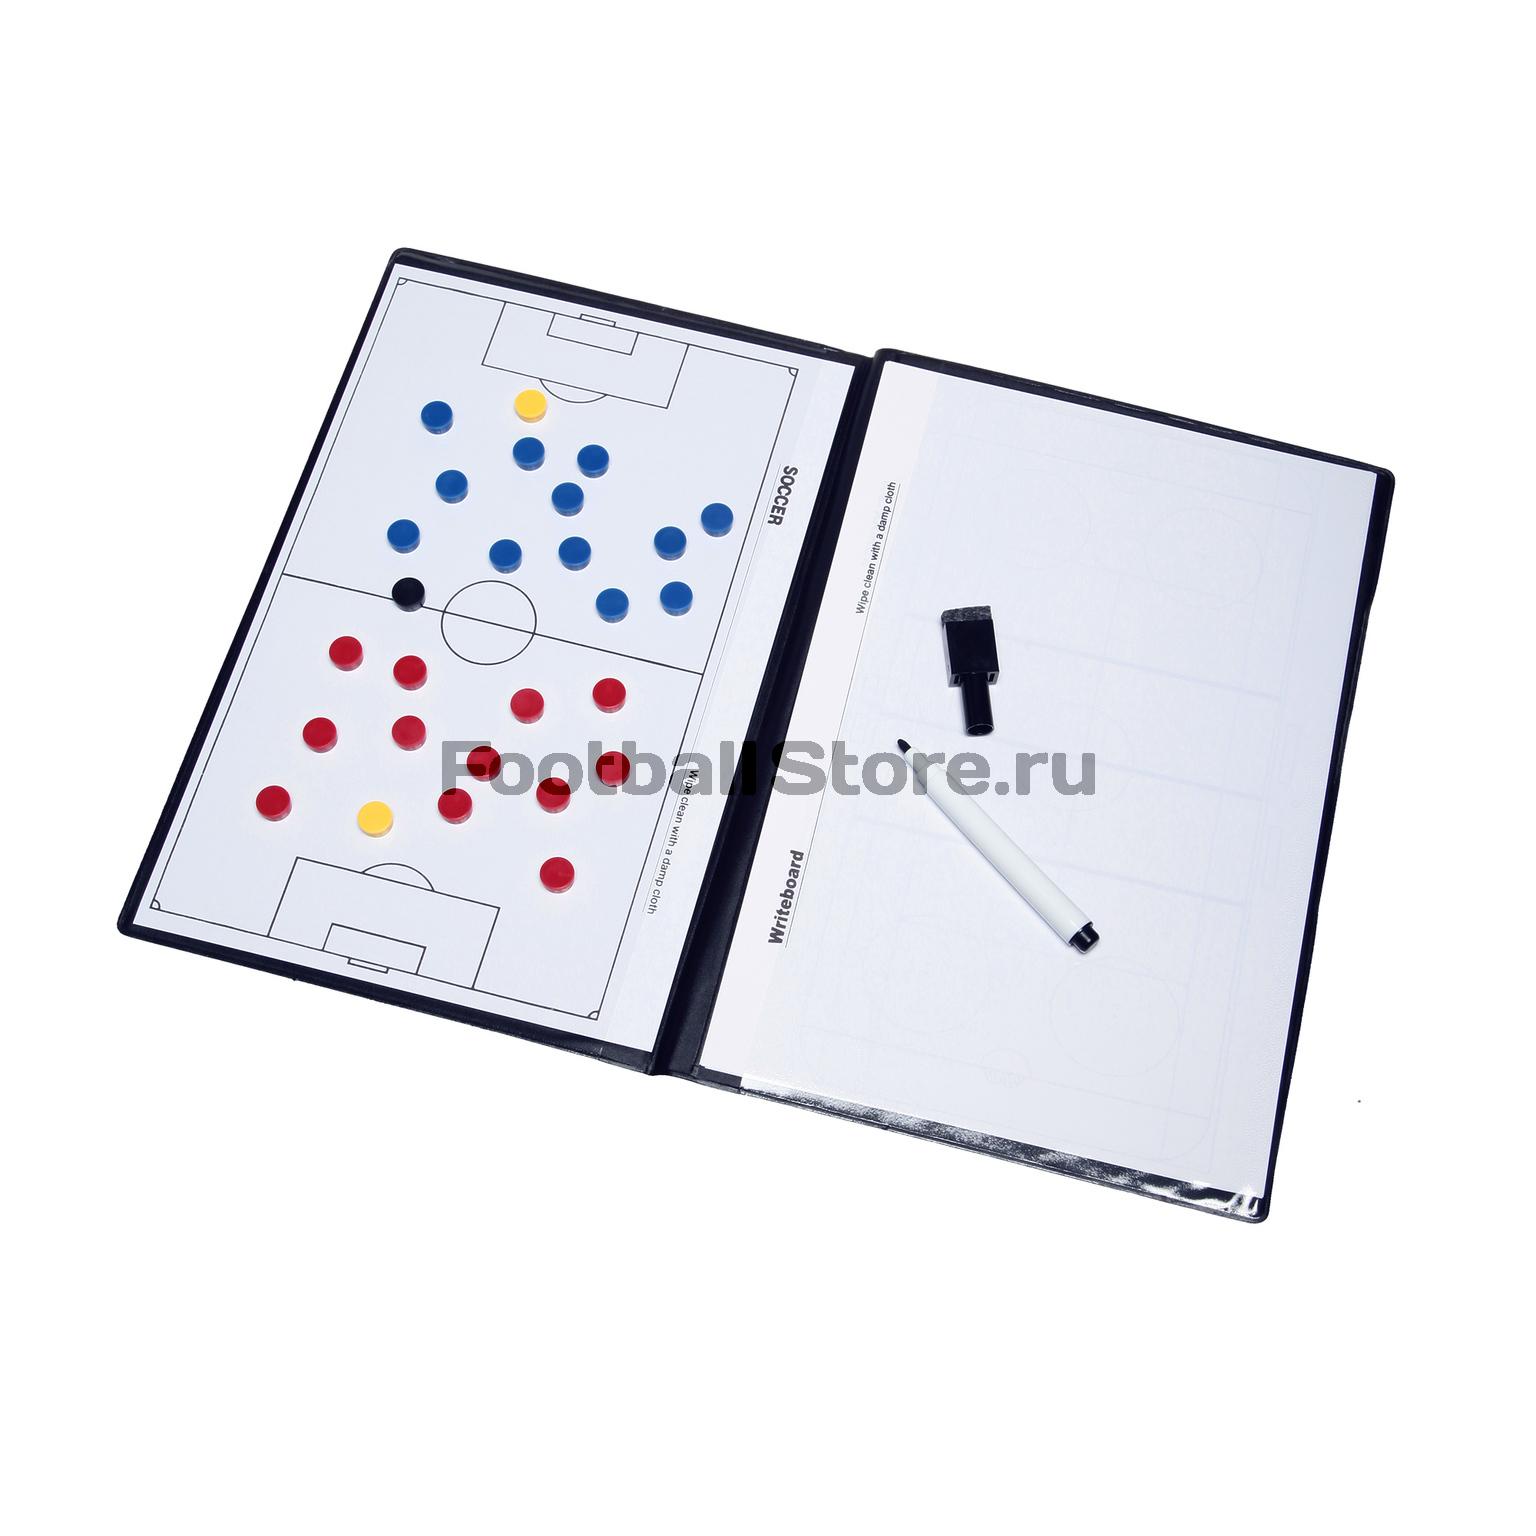 Планшет Select Tactics Case AII Games (21X30см) 793606-001